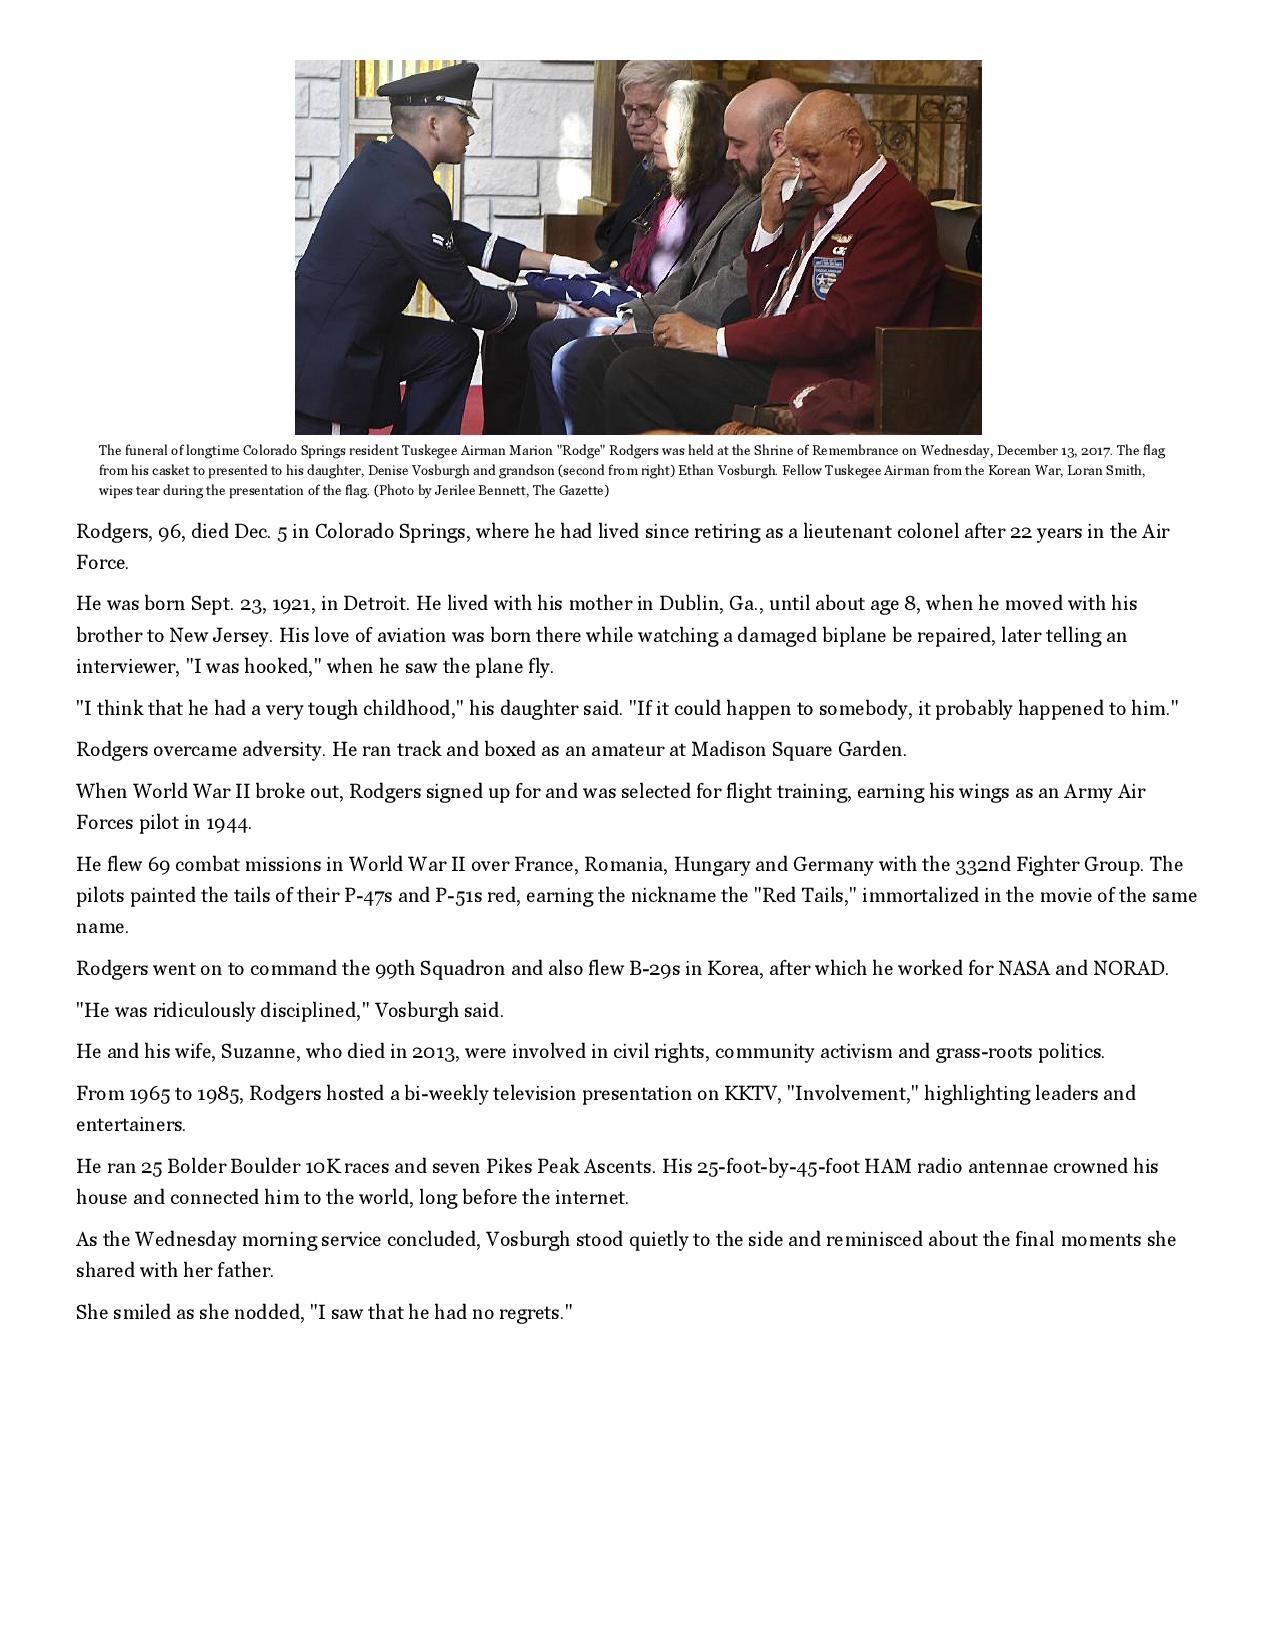 P-51_flyover_a_final_farewell_for_a_Tuskegee_Airman___Colorado_Springs_Gazette_News-page-002 (1)